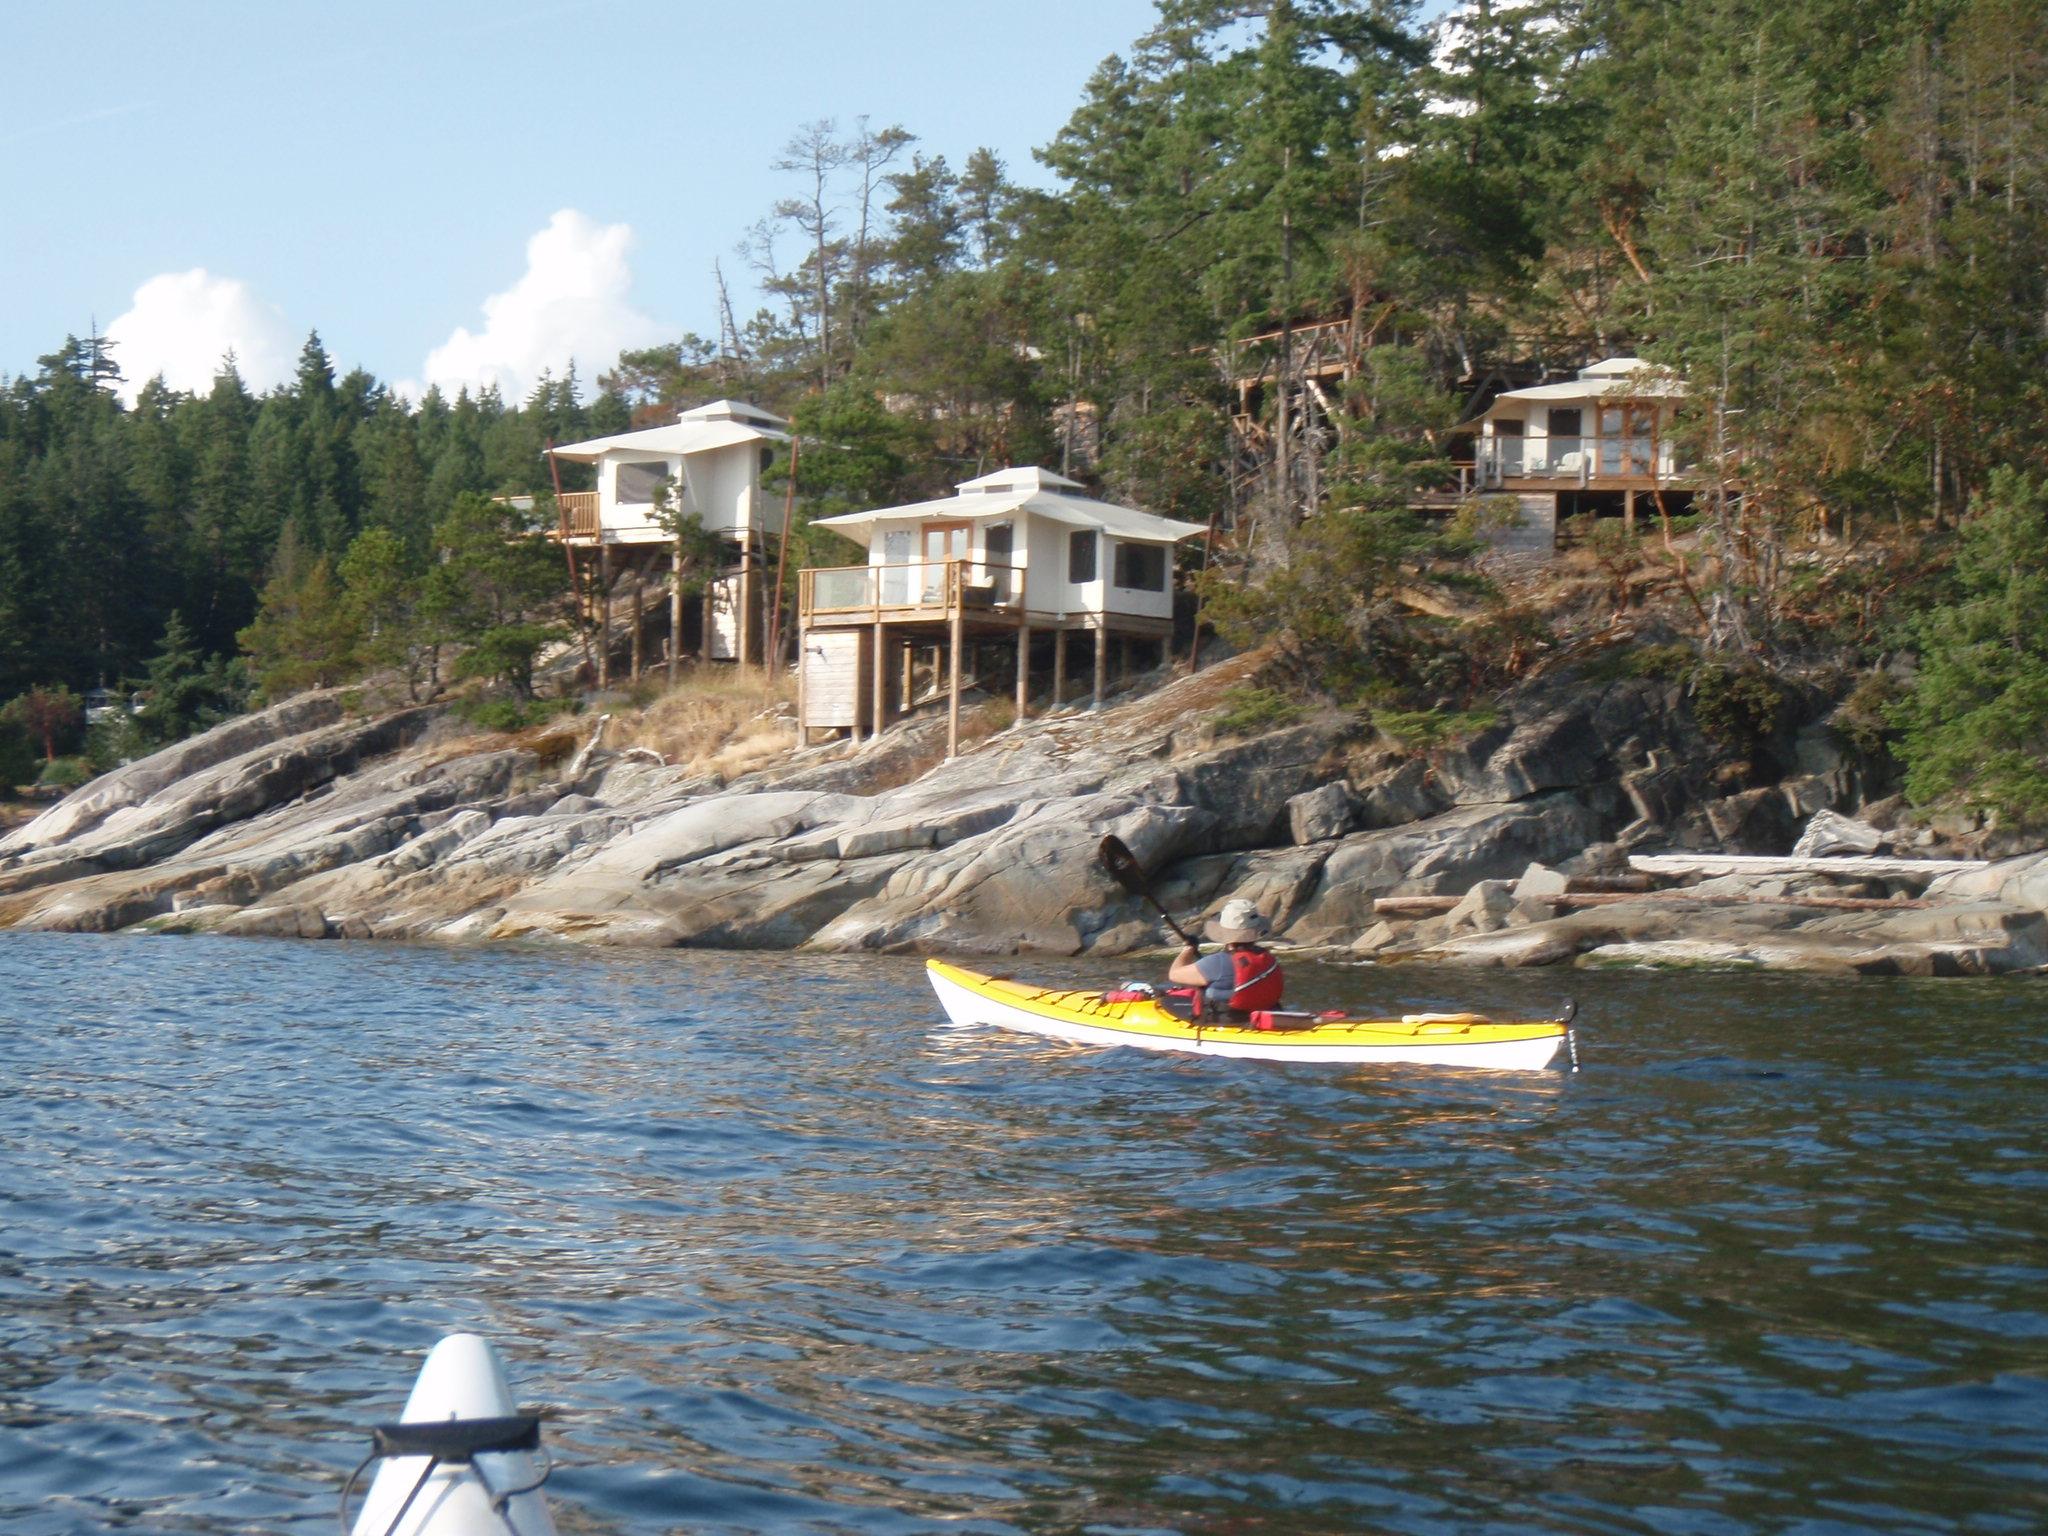 Kayaking the Sunshine Coast of British Columbia near Secret Cove (Sechelt)